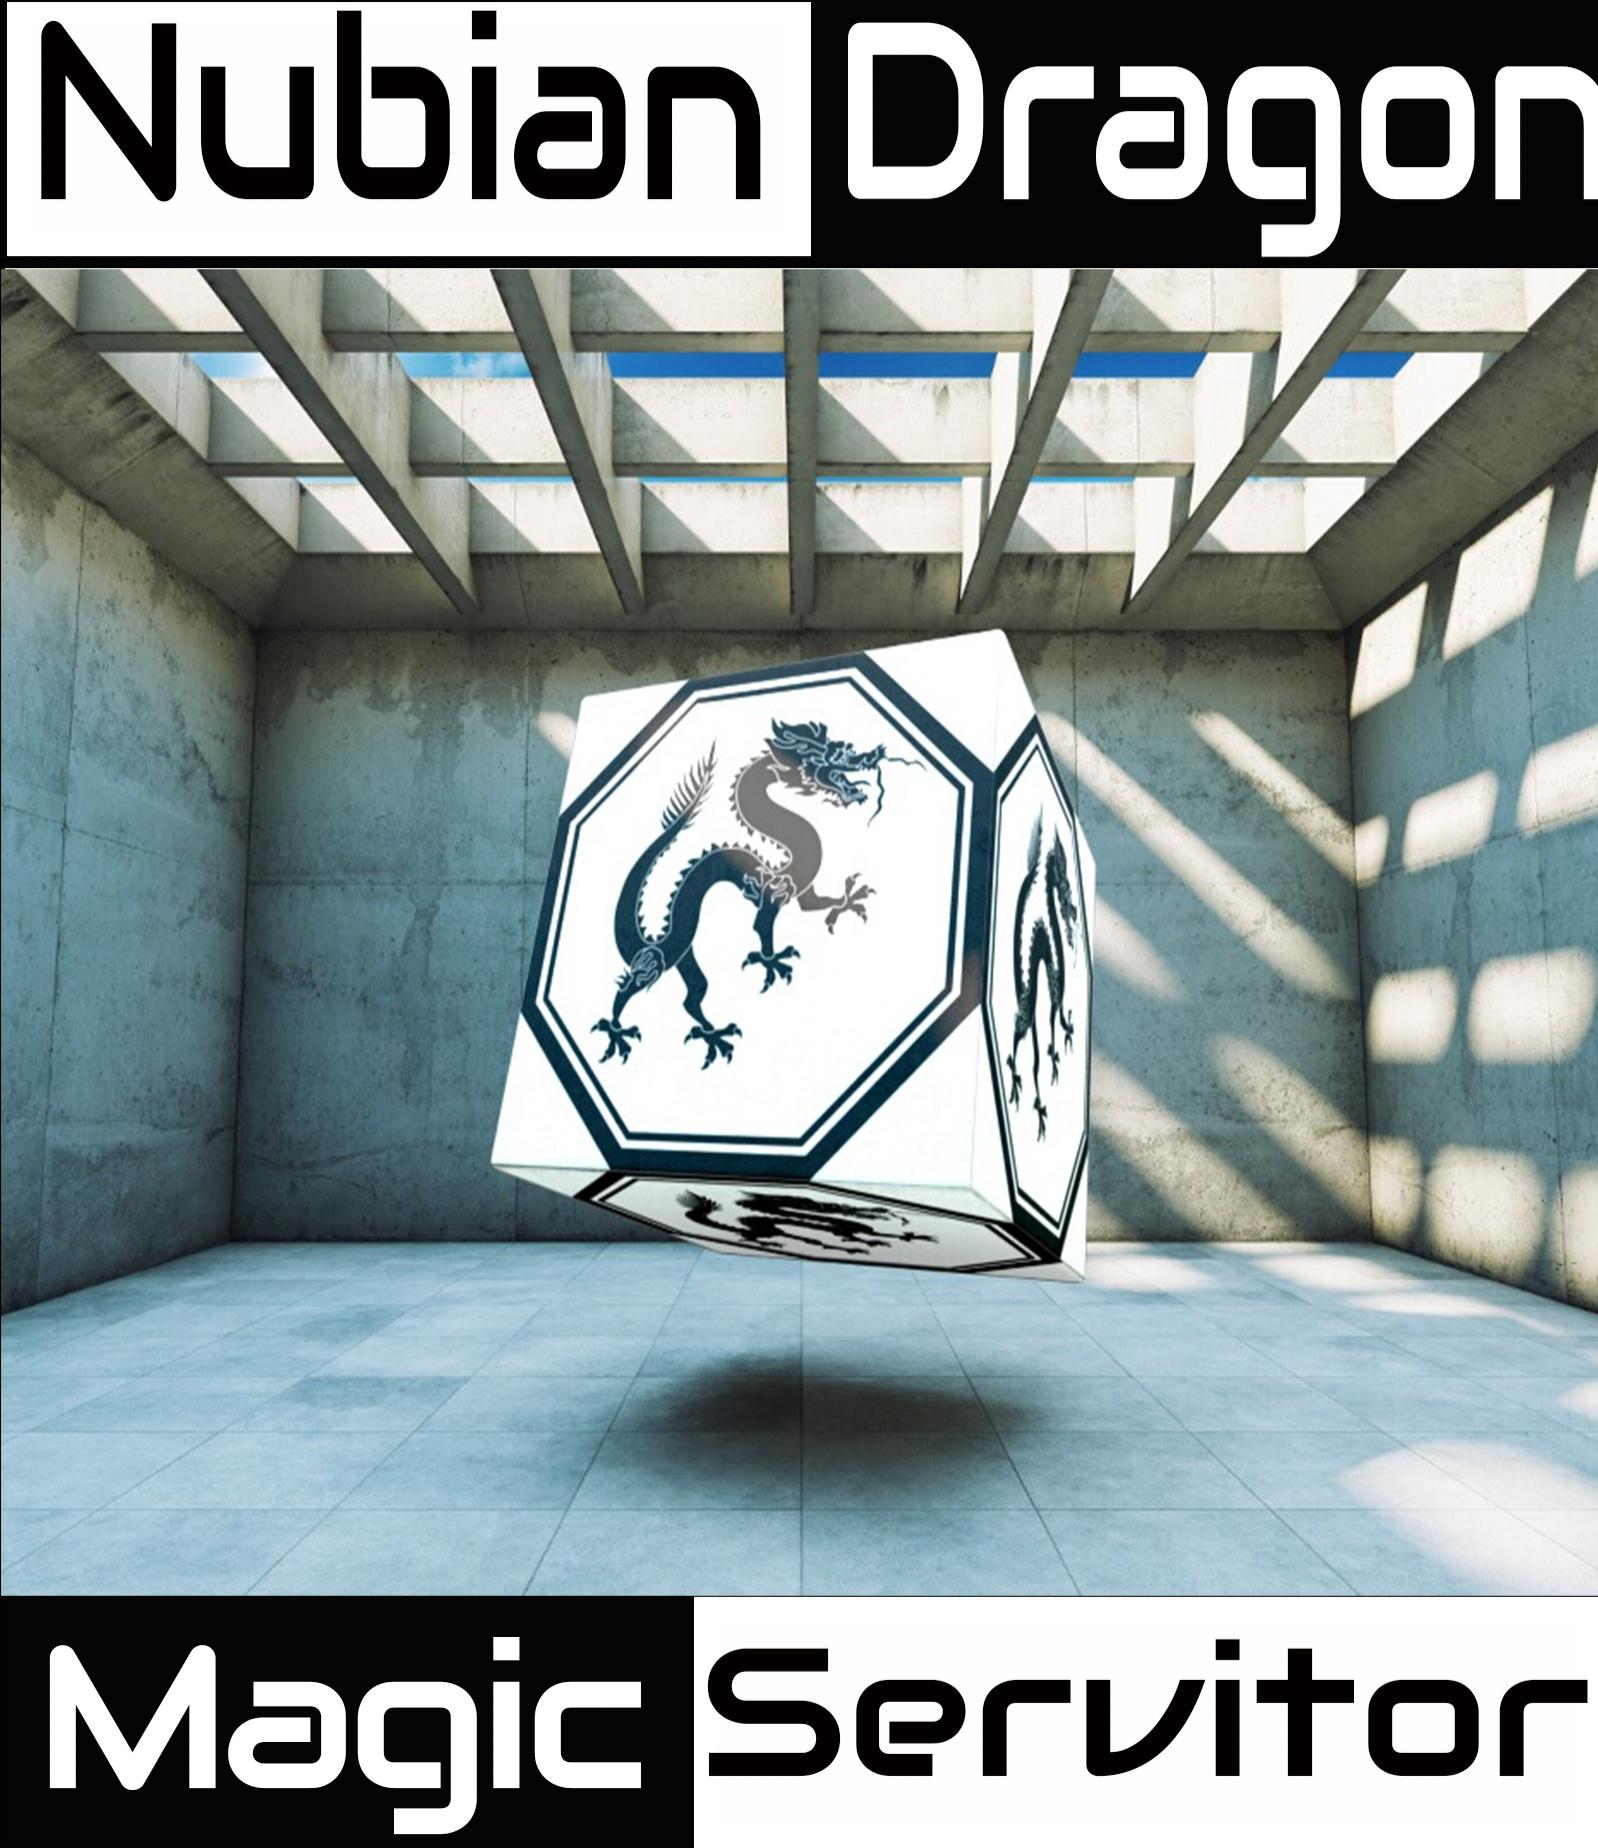 NUBIAN DRAGON SERVITOR